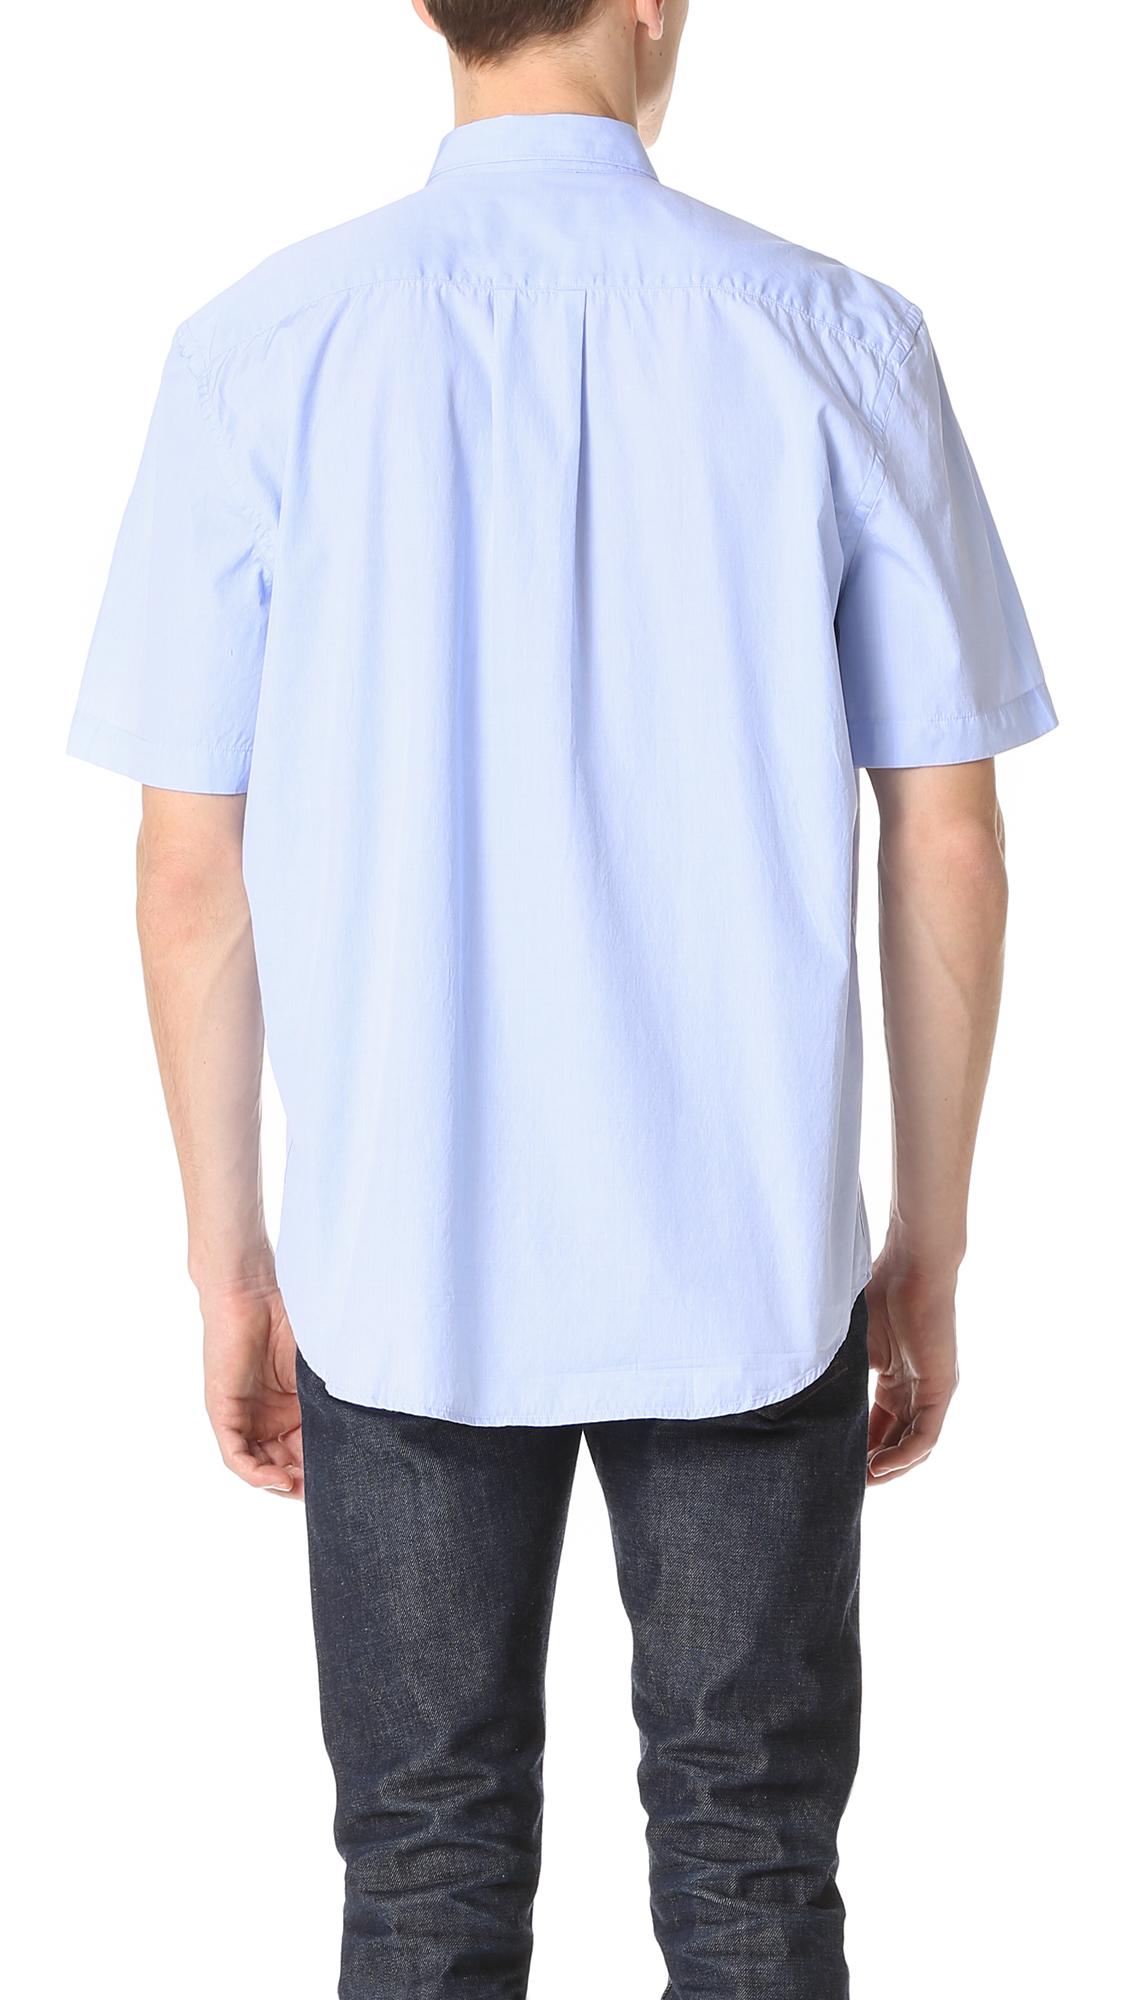 dfe4de09e Vineyard Vines Womens Long Sleeve T Shirt Amazon